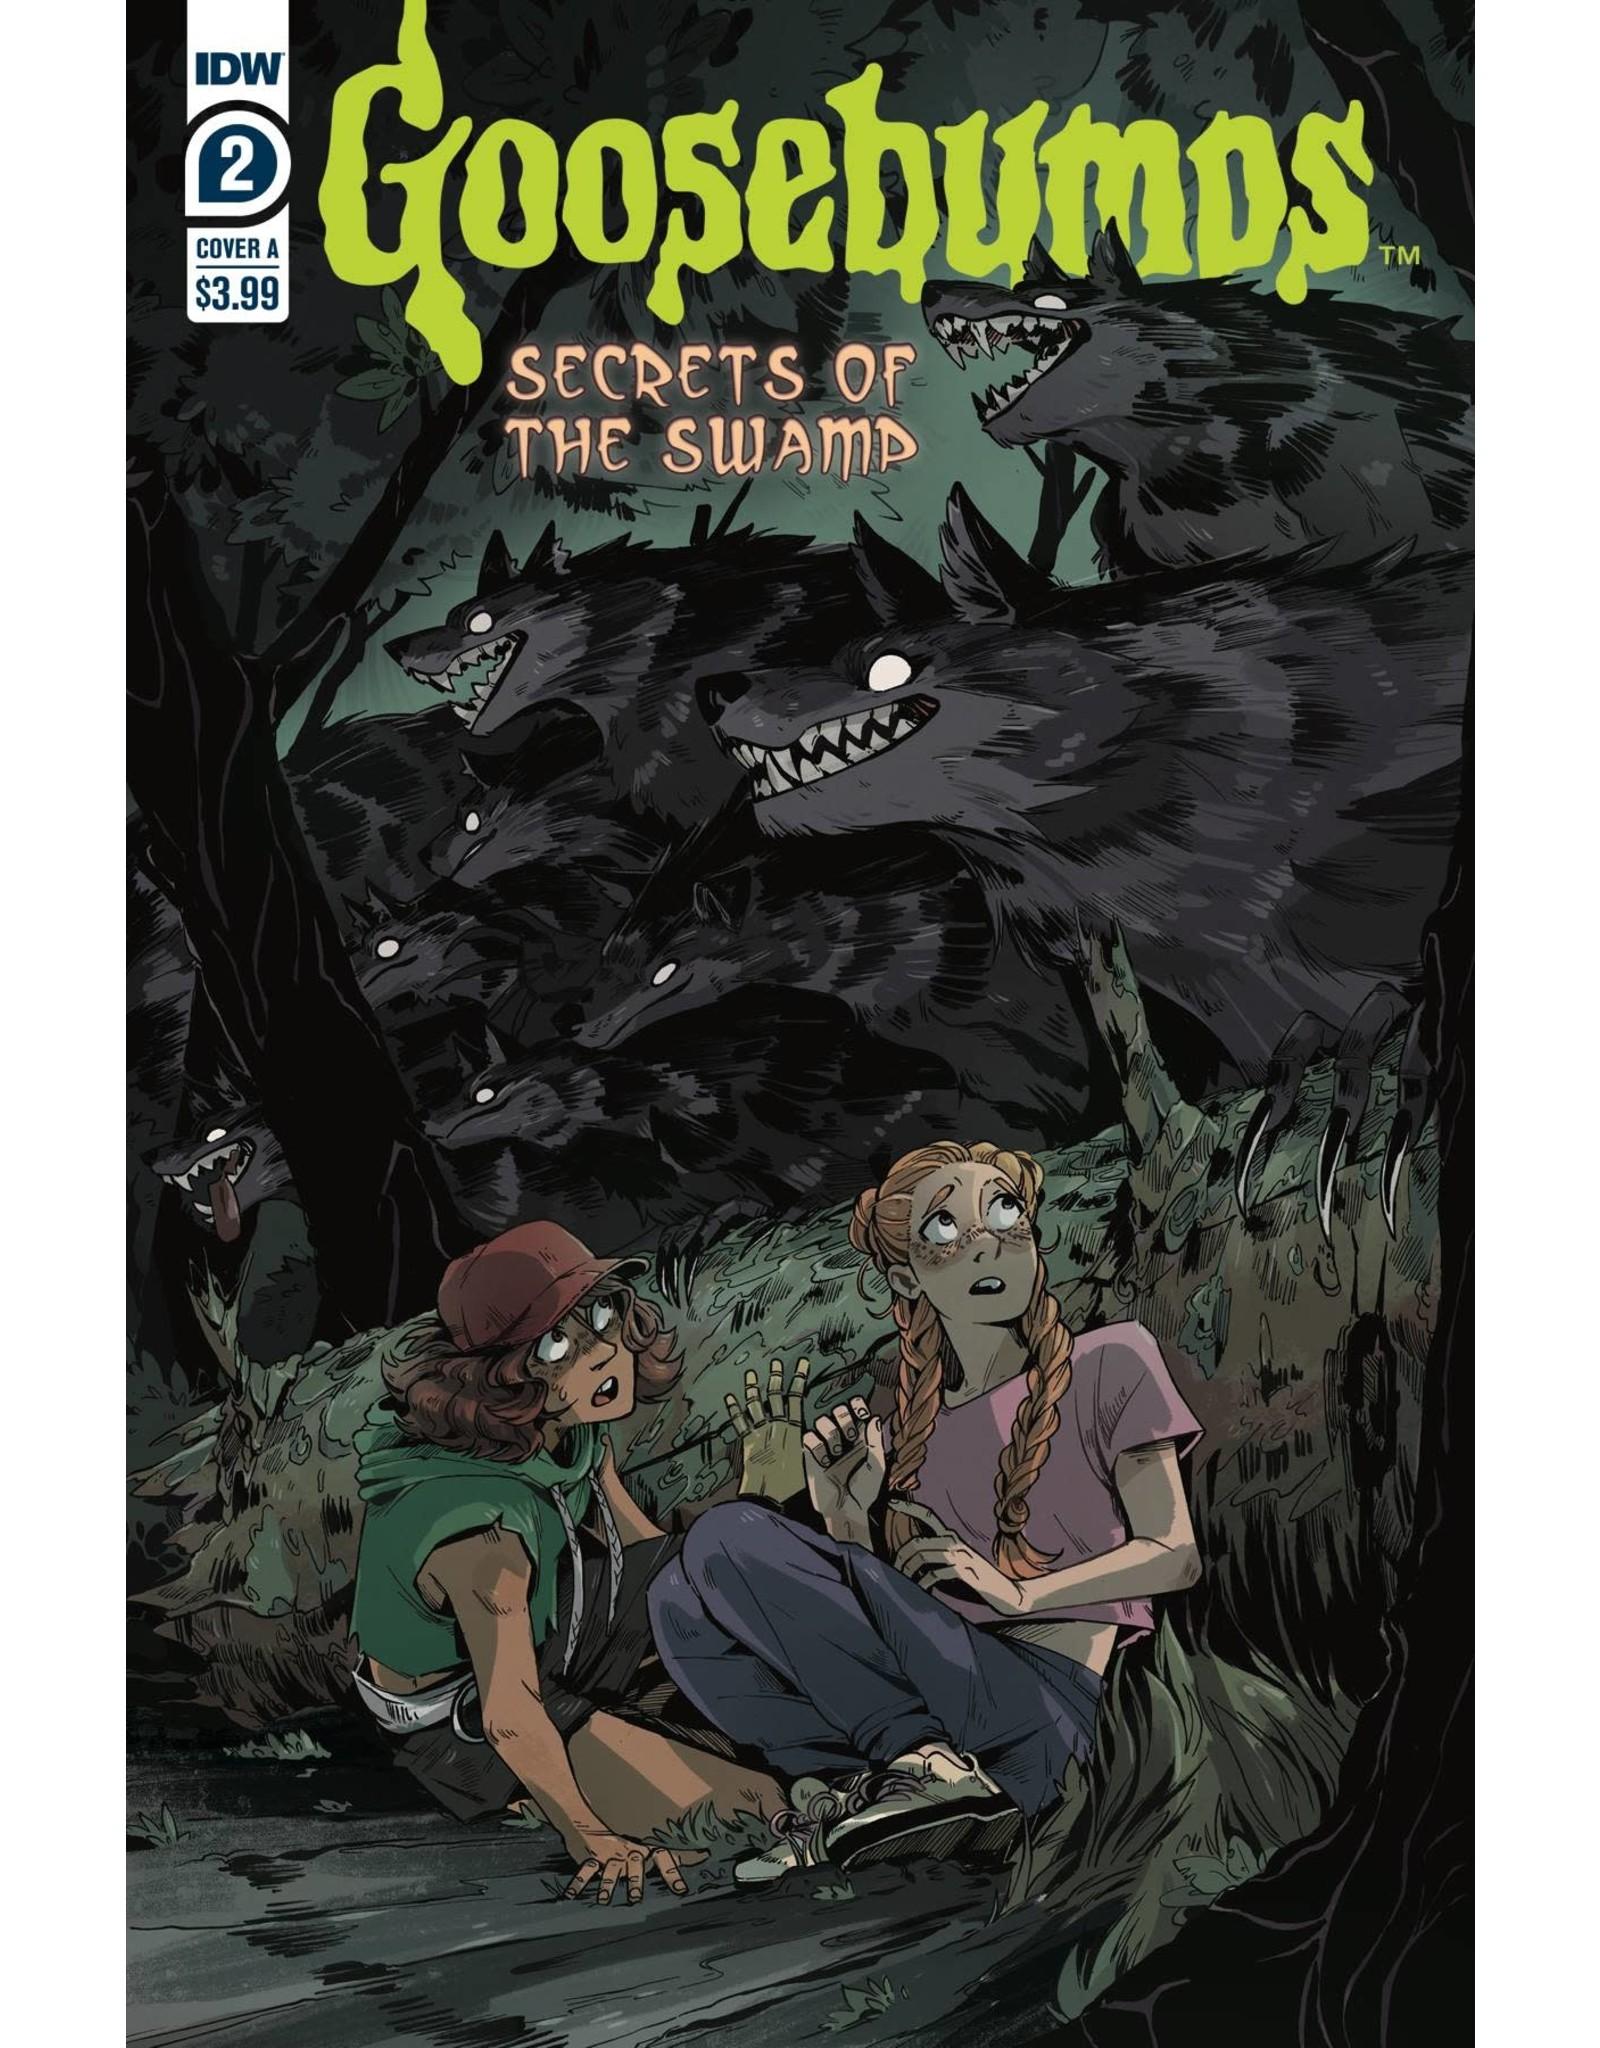 IDW PUBLISHING GOOSEBUMPS SECRETS OF THE SWAMP #2 (OF 5)